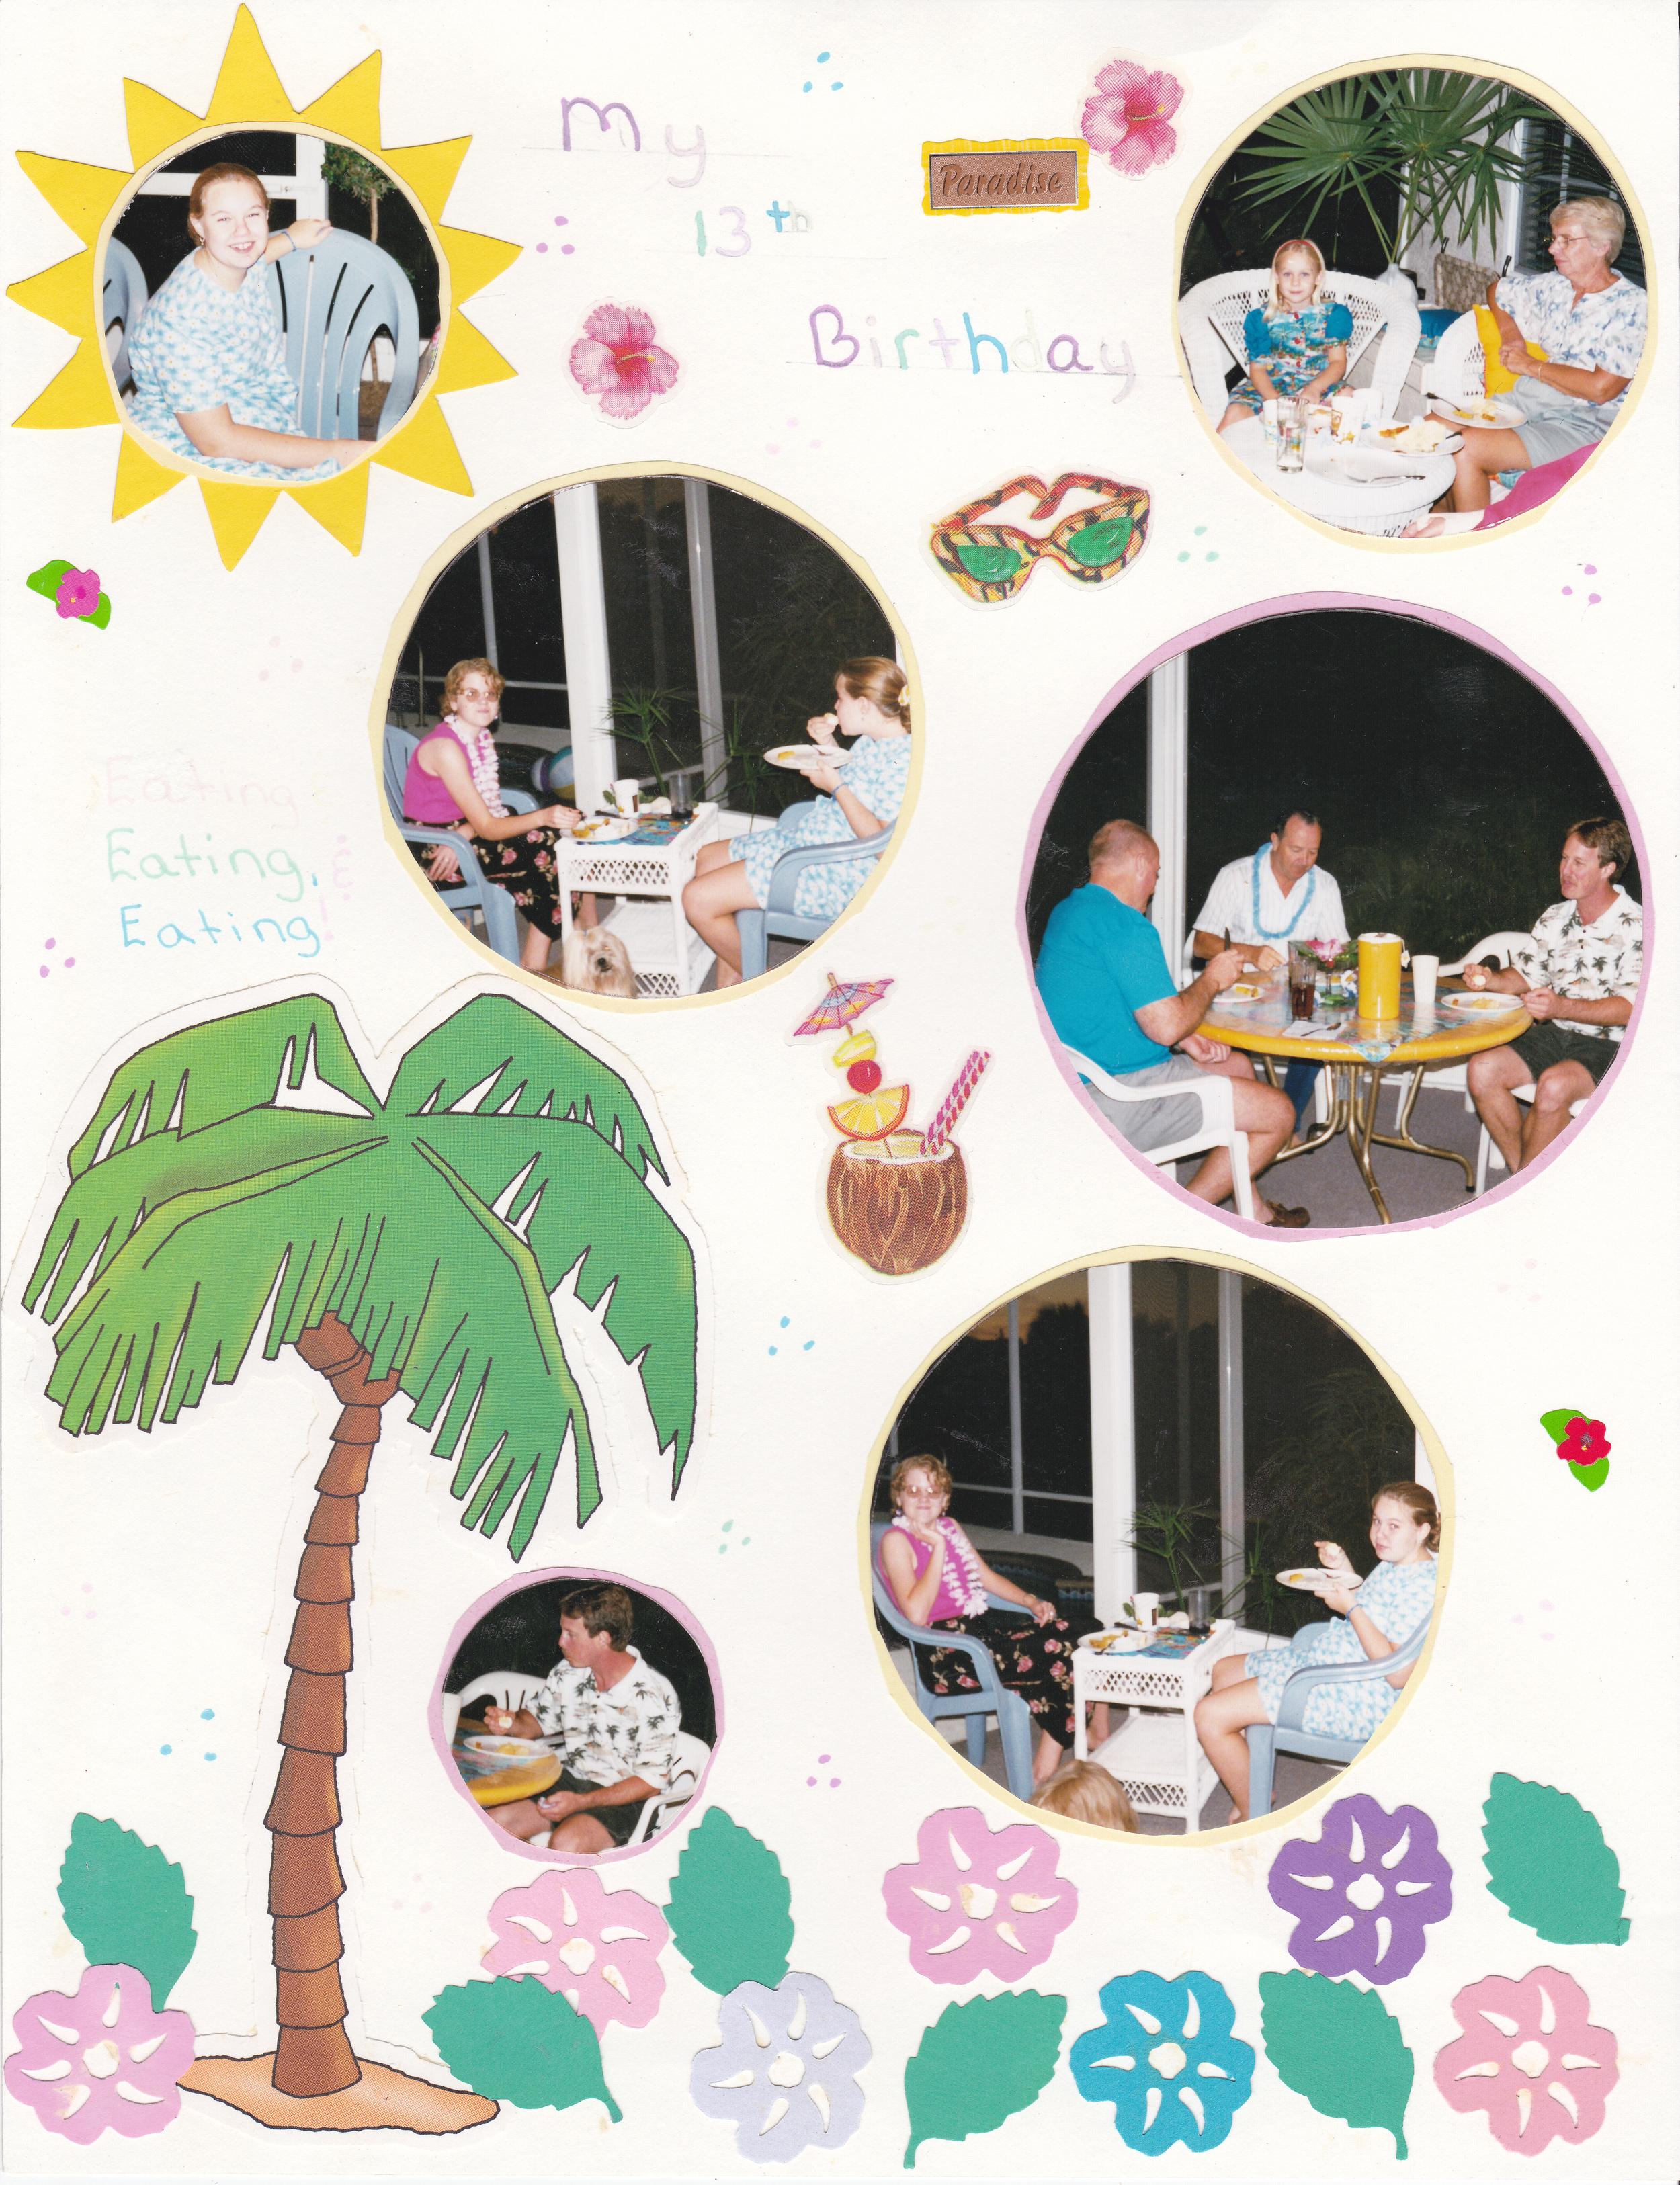 A 8.5 x11 Scrapbook page circa 1999